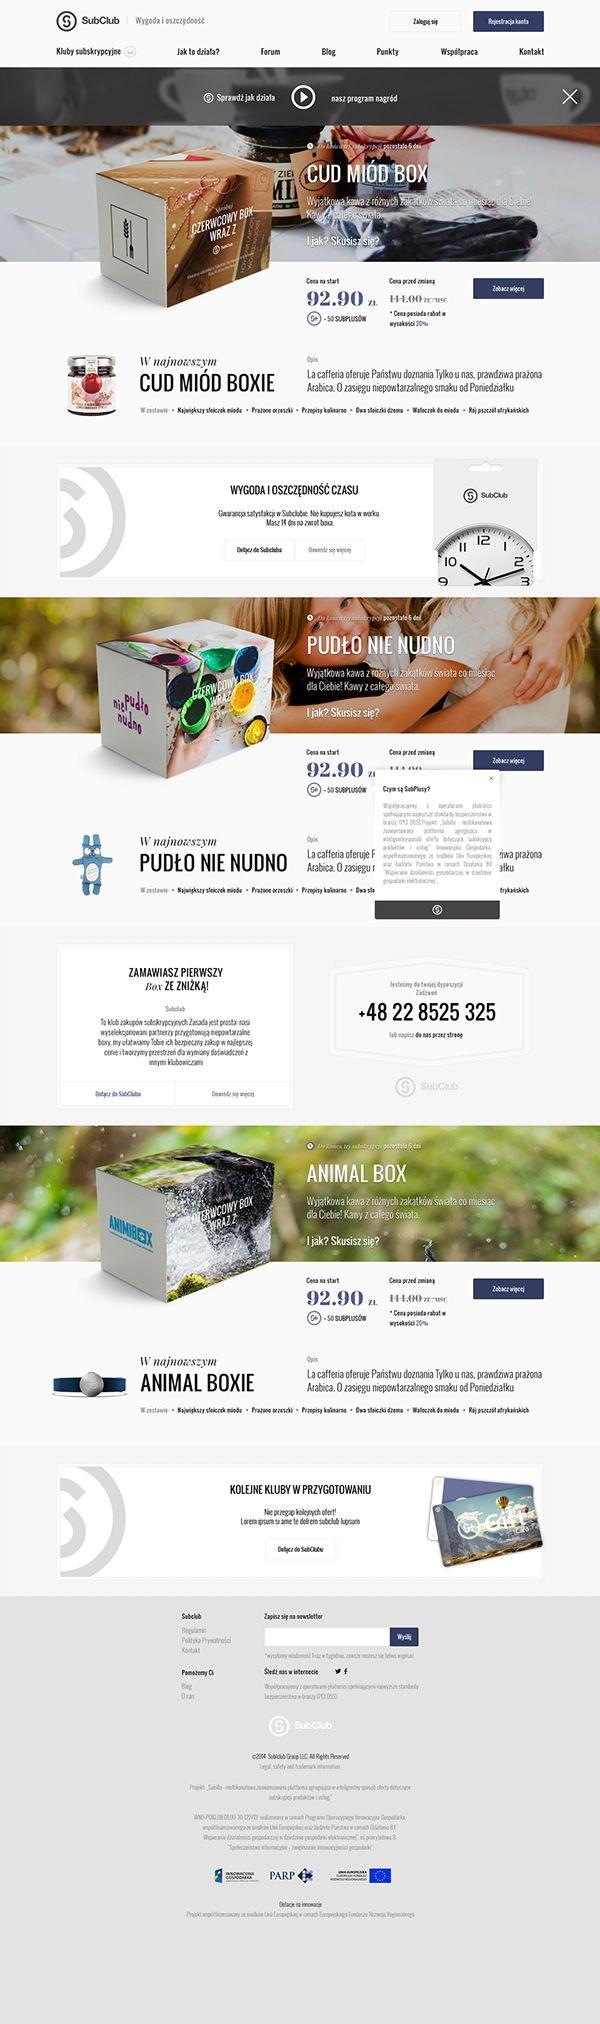 Subclub #website #web #webdesign [www.pinterest.com/loganless]